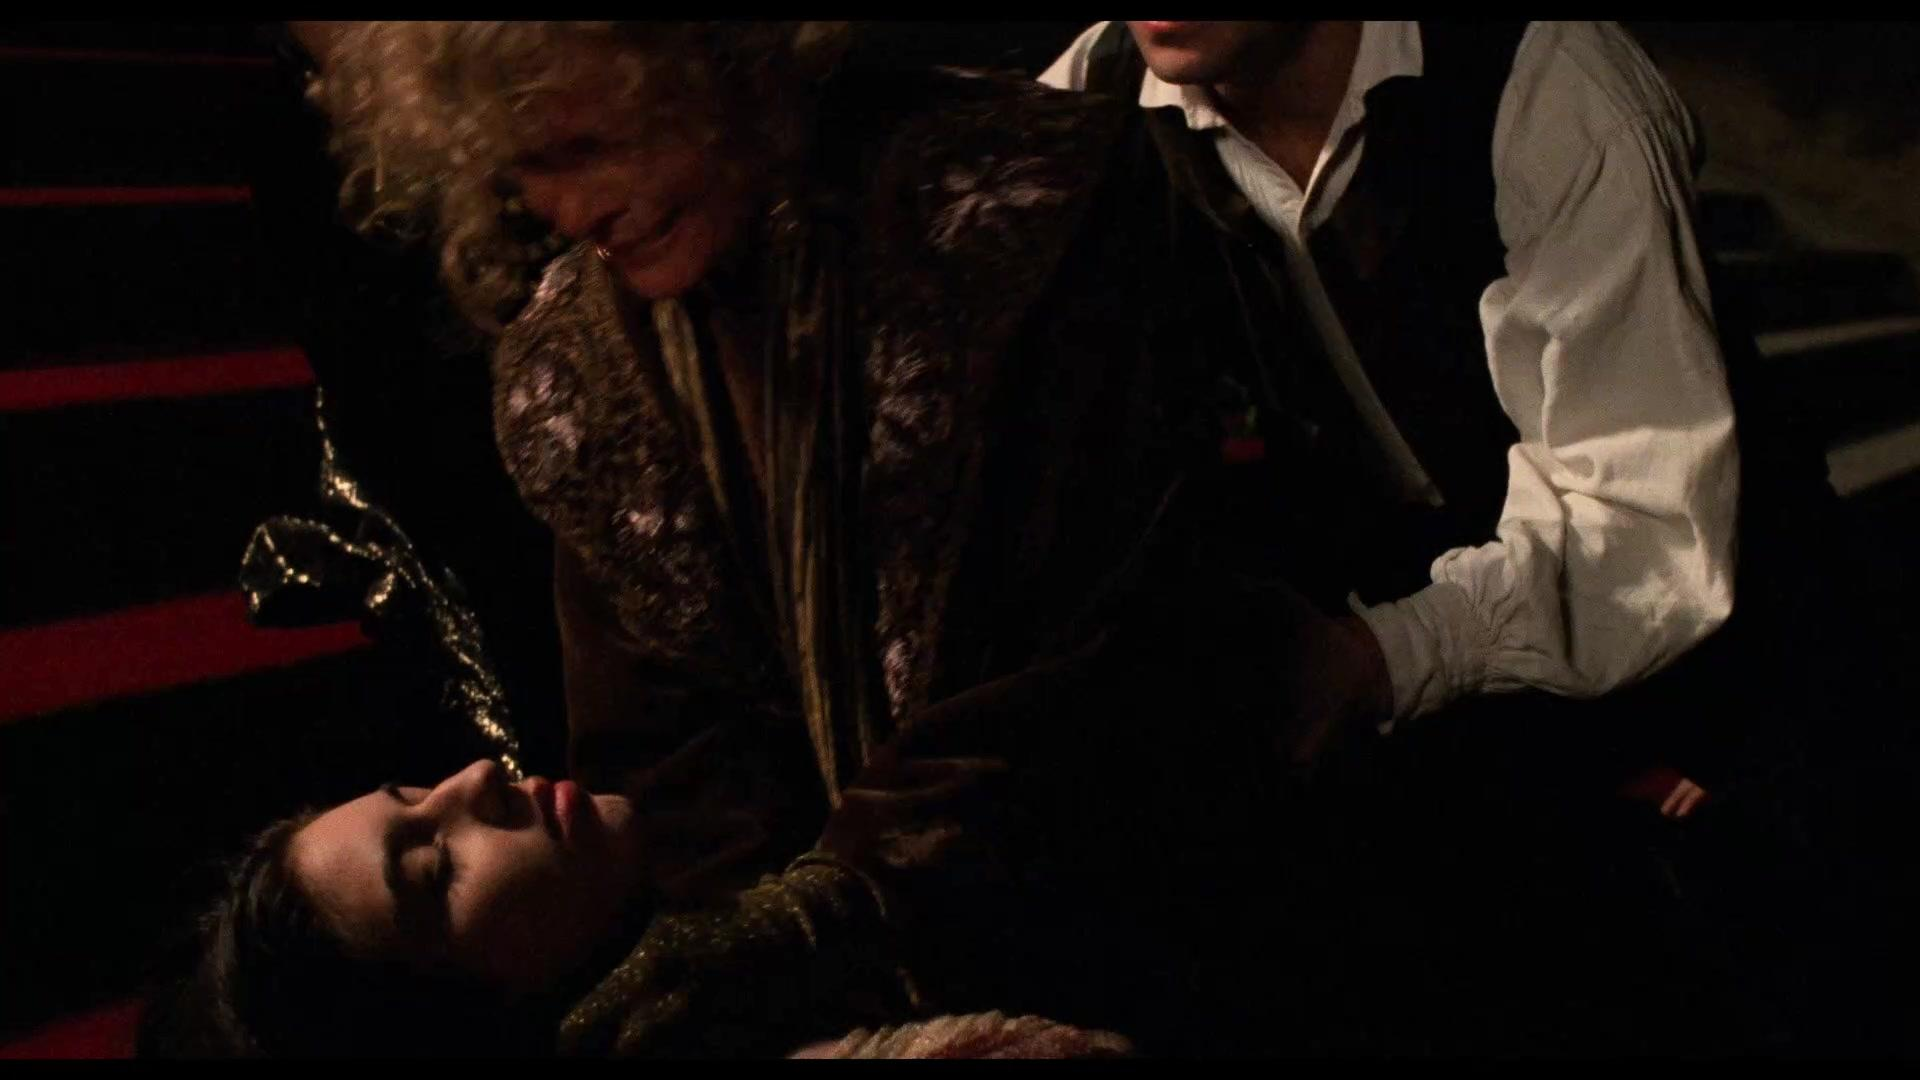 El Padrino Epílogo La muerte De Michael Corleone [2020][BD-Rip][1080p][Lat-Cas-Ing][VS]